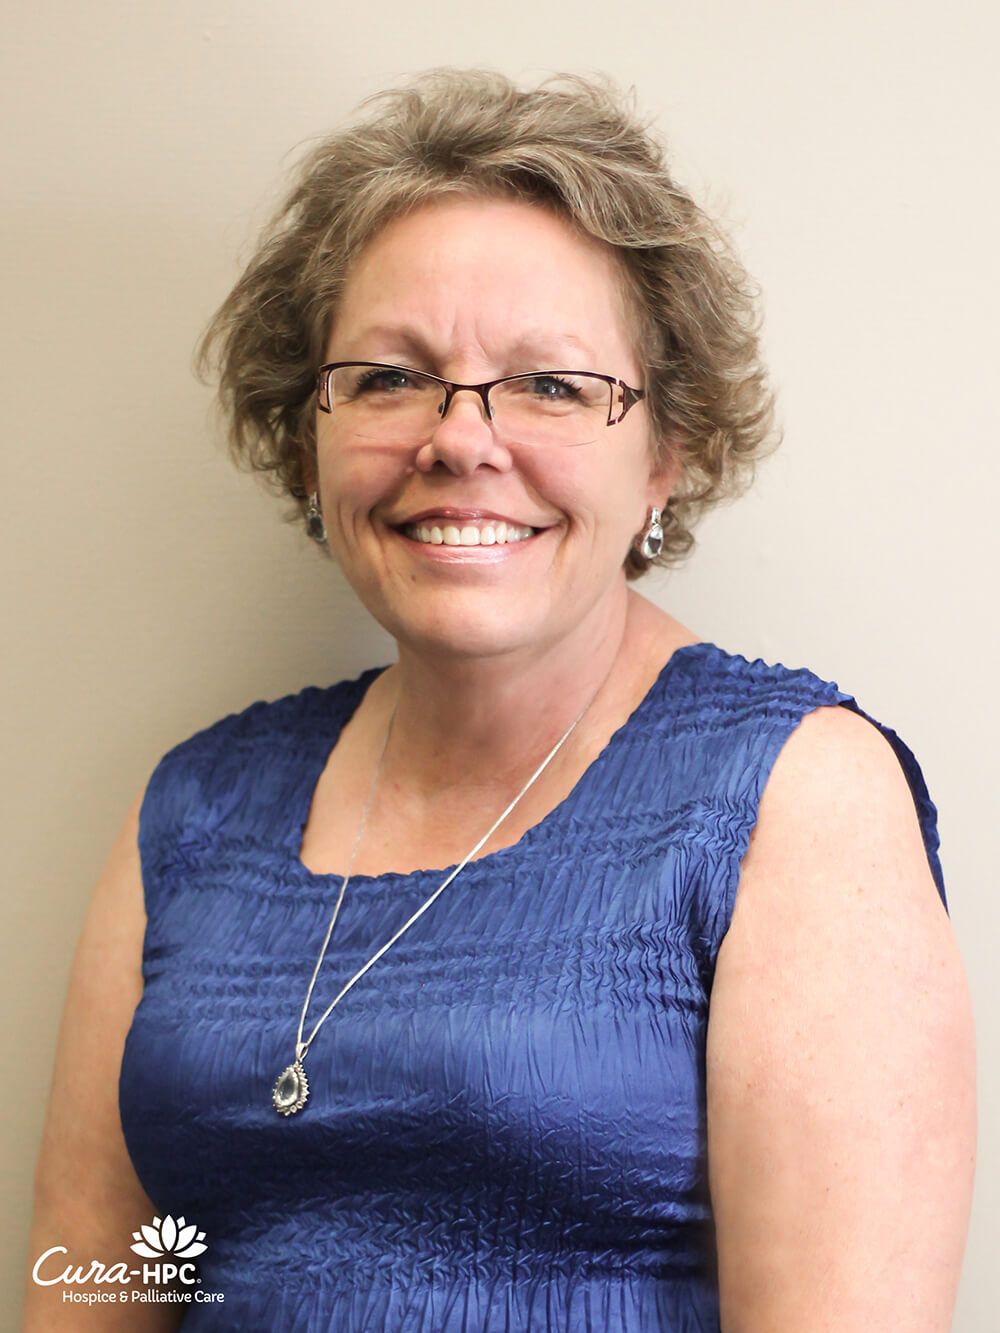 Christina Snyder